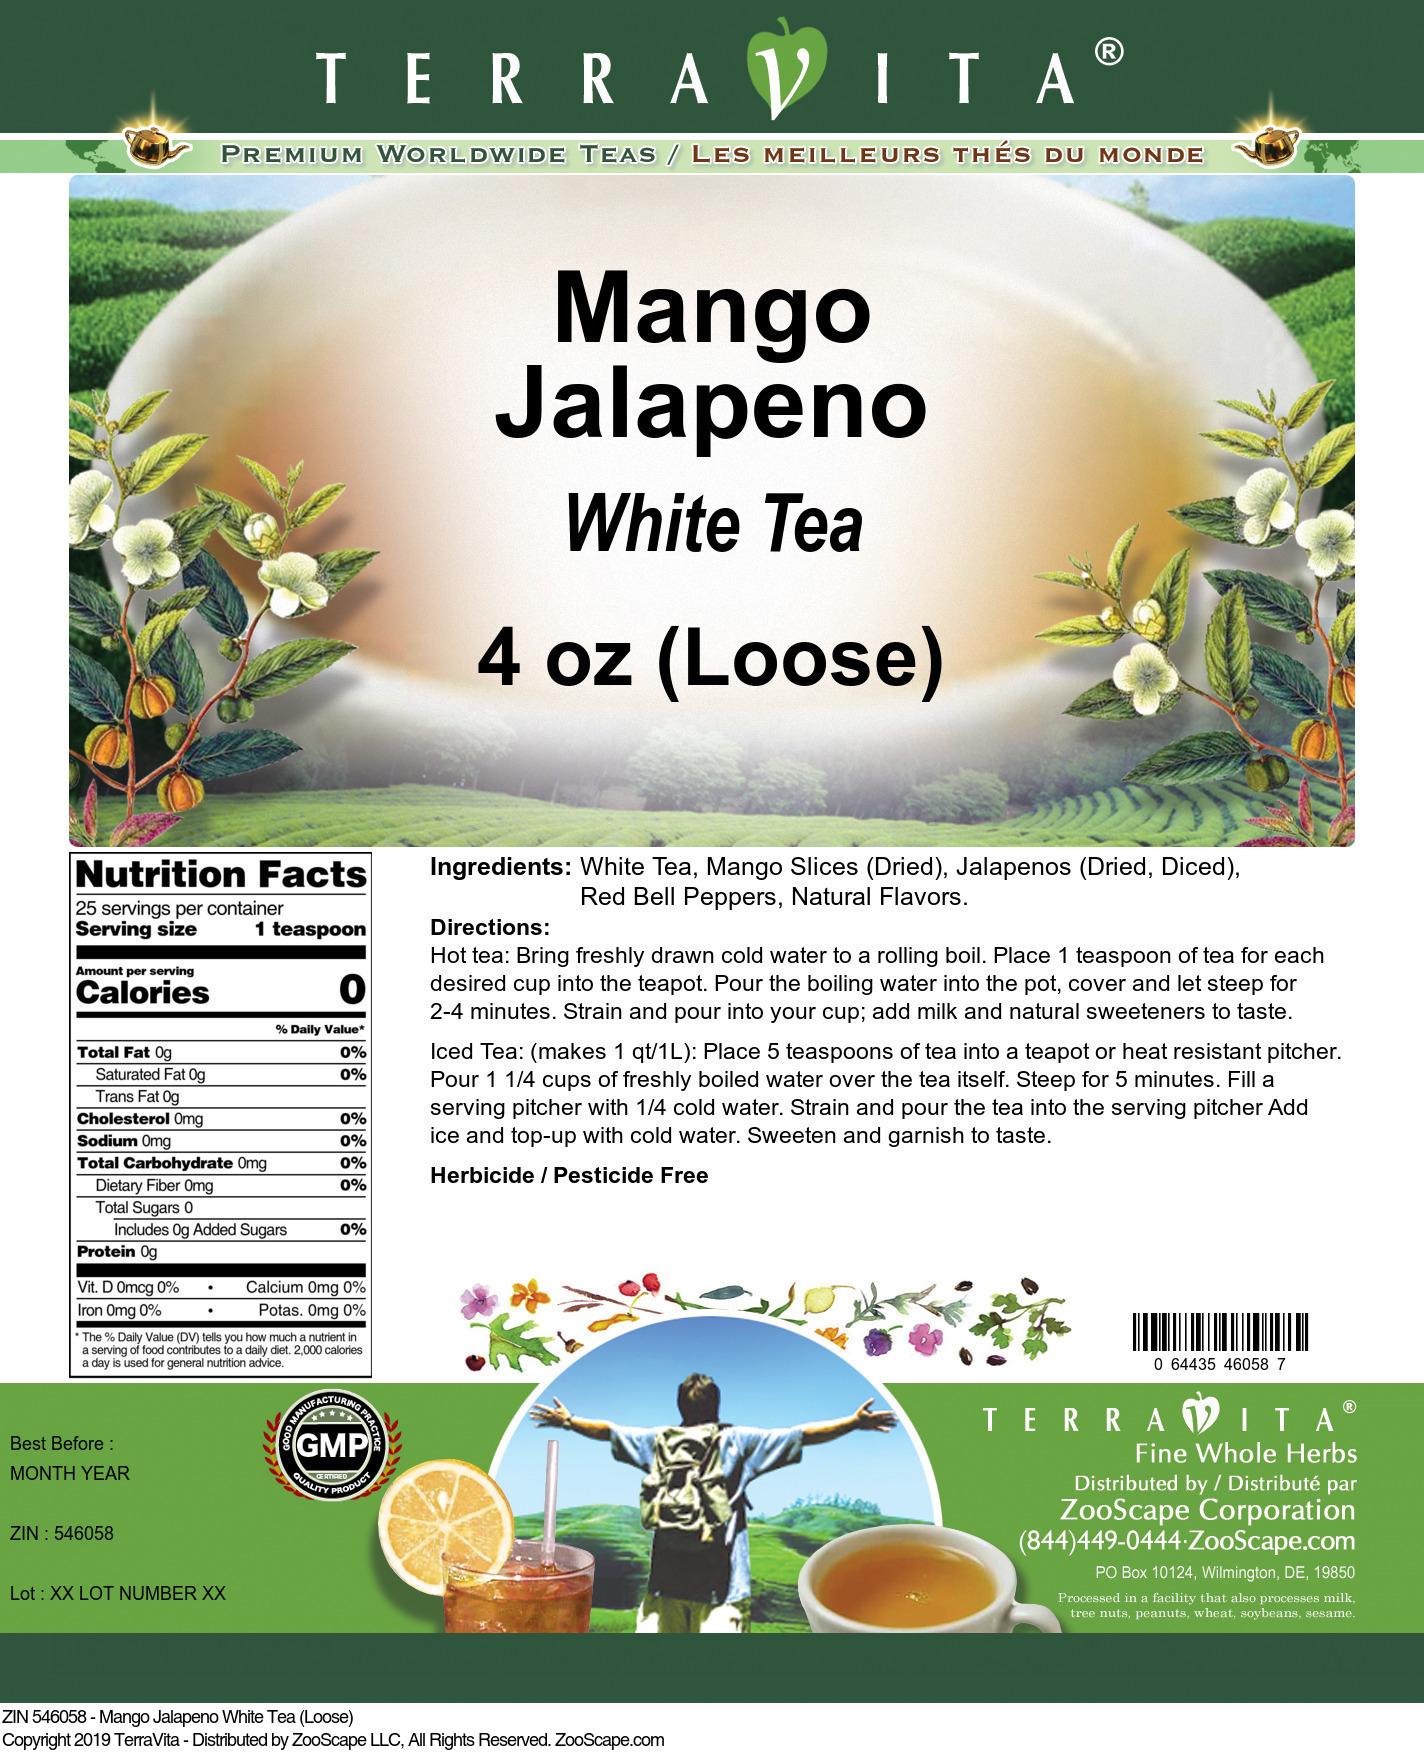 Mango Jalapeno White Tea (Loose)